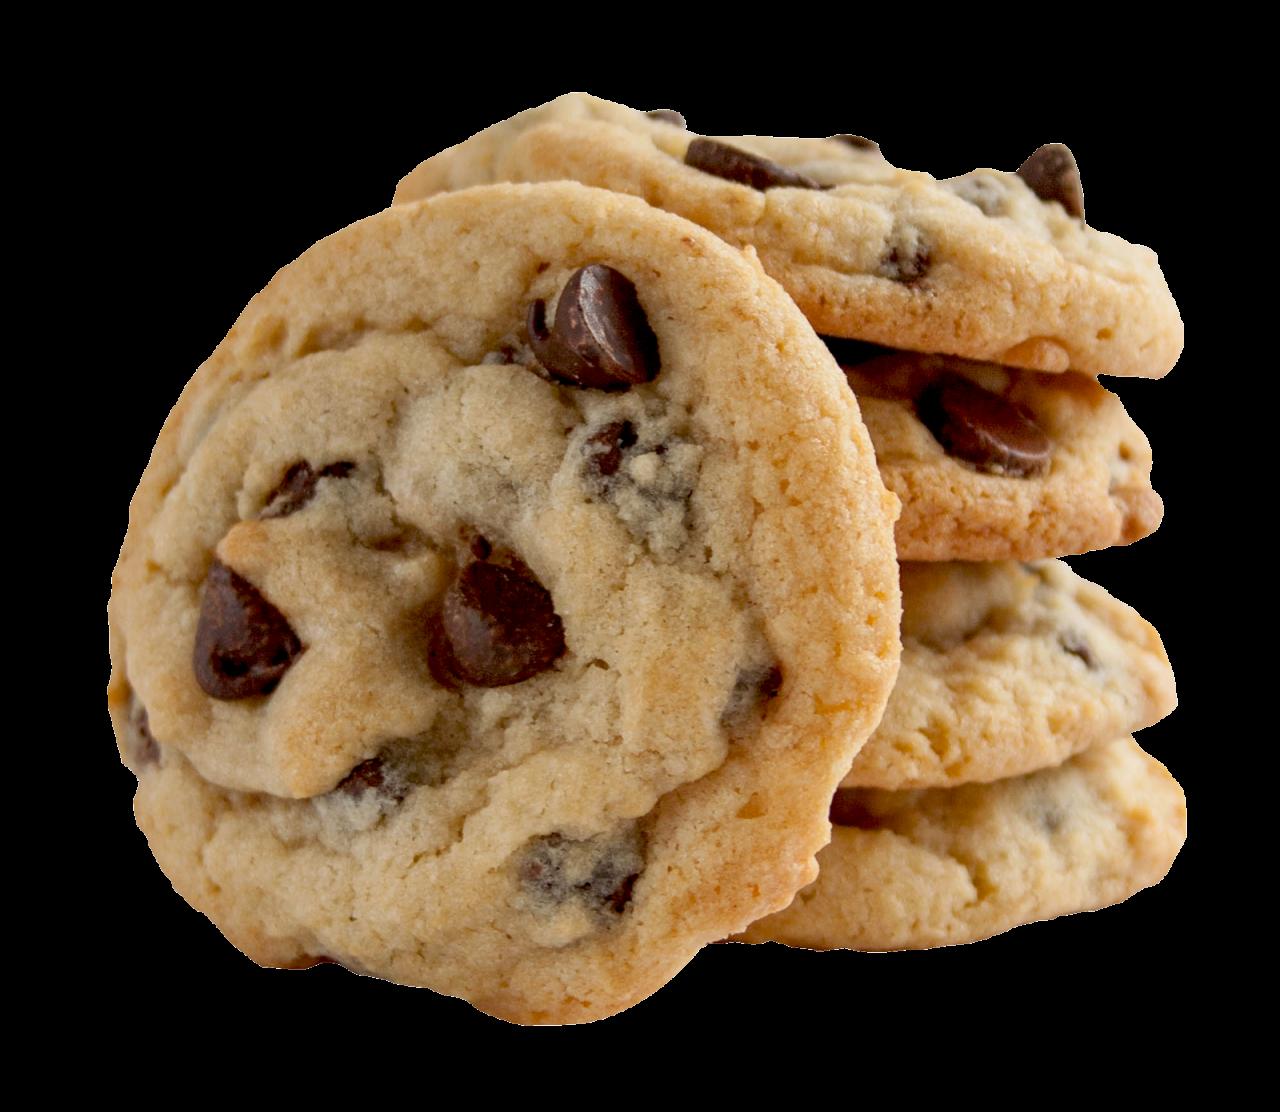 Cookie PNG Image